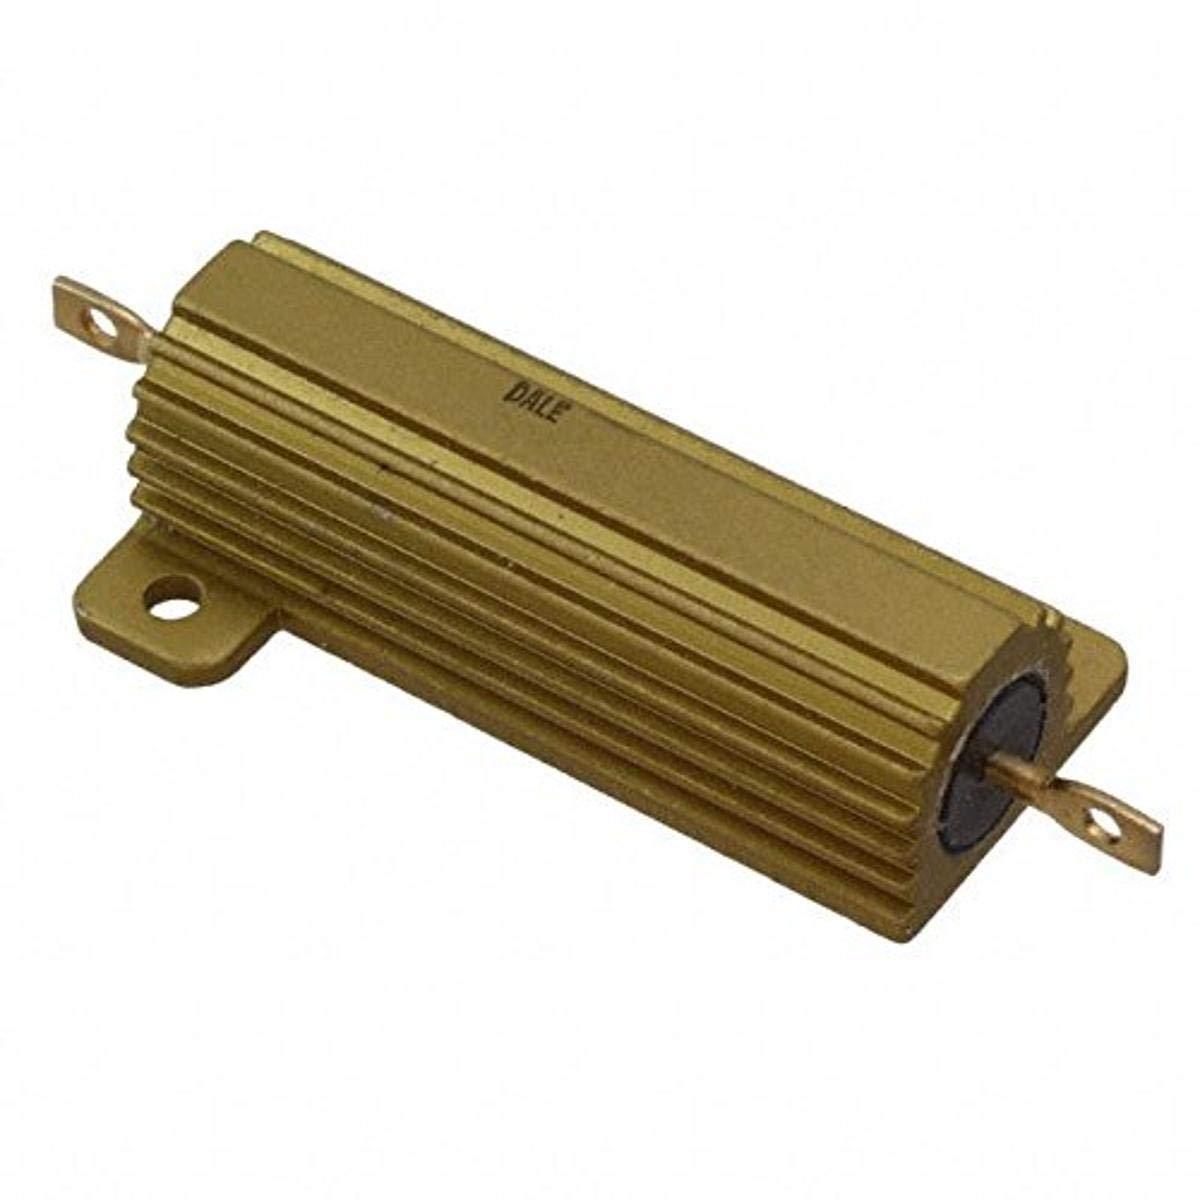 Vishay-Dale Columbus Mall RH0508R000FE02 Wire wound Resistor 50 Watt High order 8 Ohm